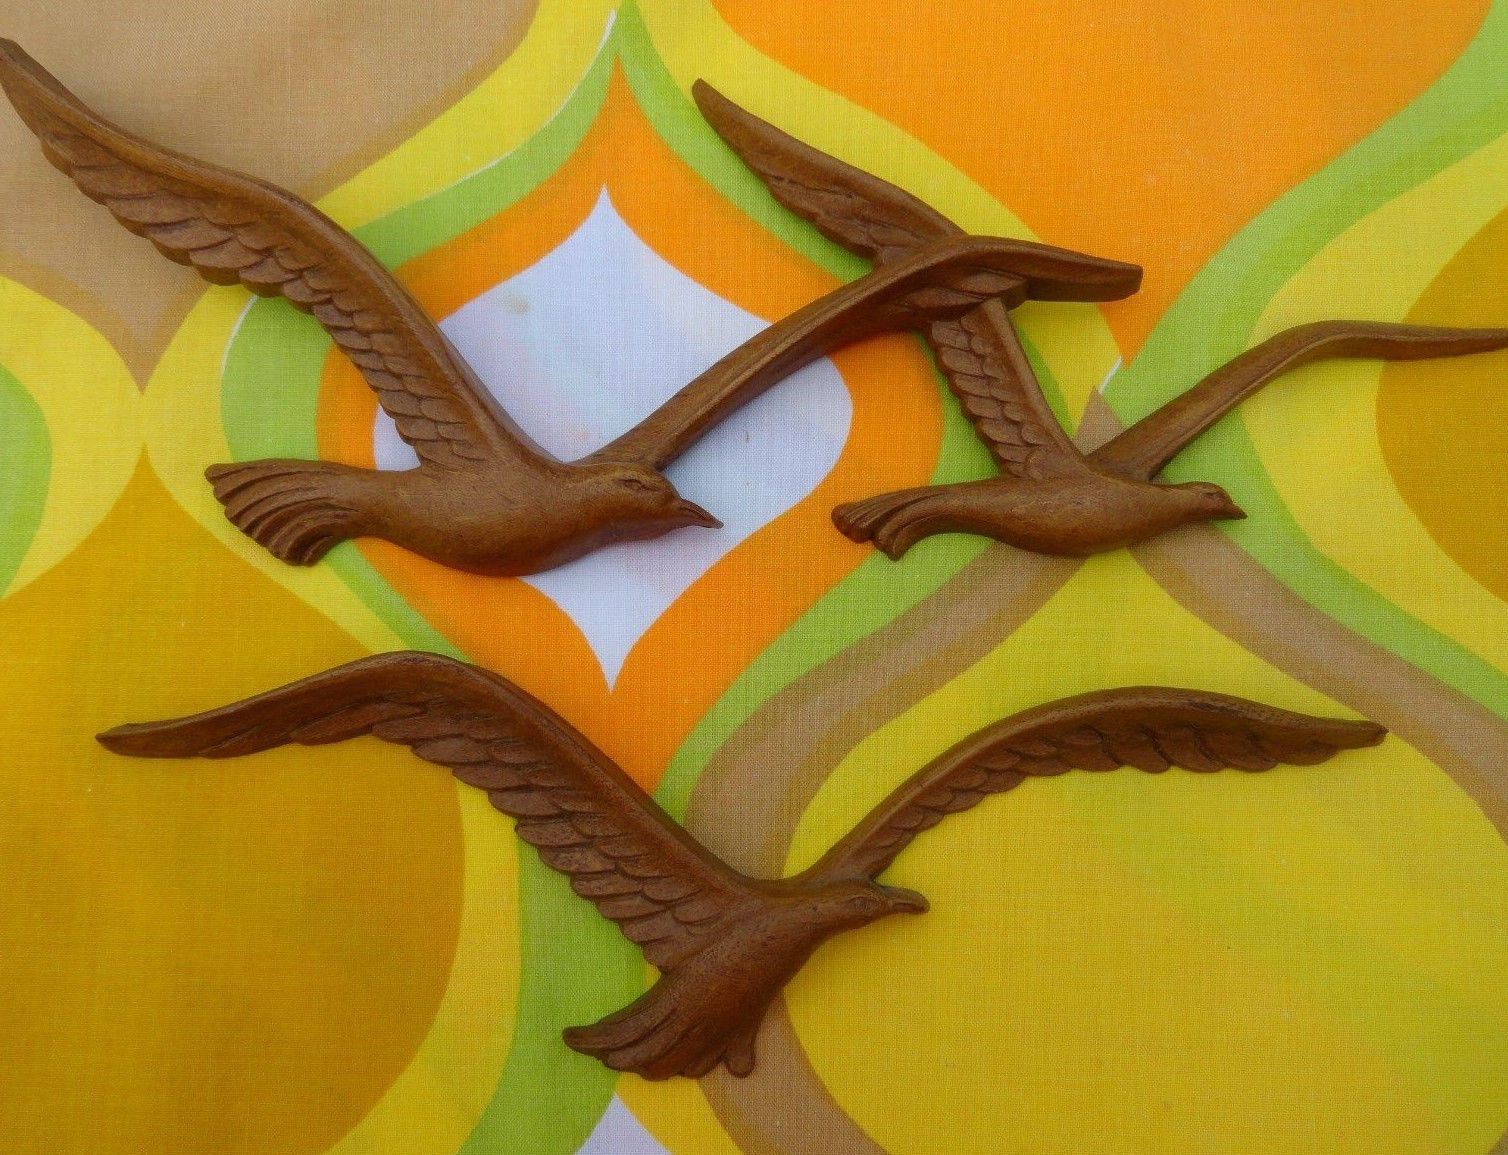 30.00 VTG 1970s MID Century Modern HOMCO Seagulls Birds Plastic Wood ...